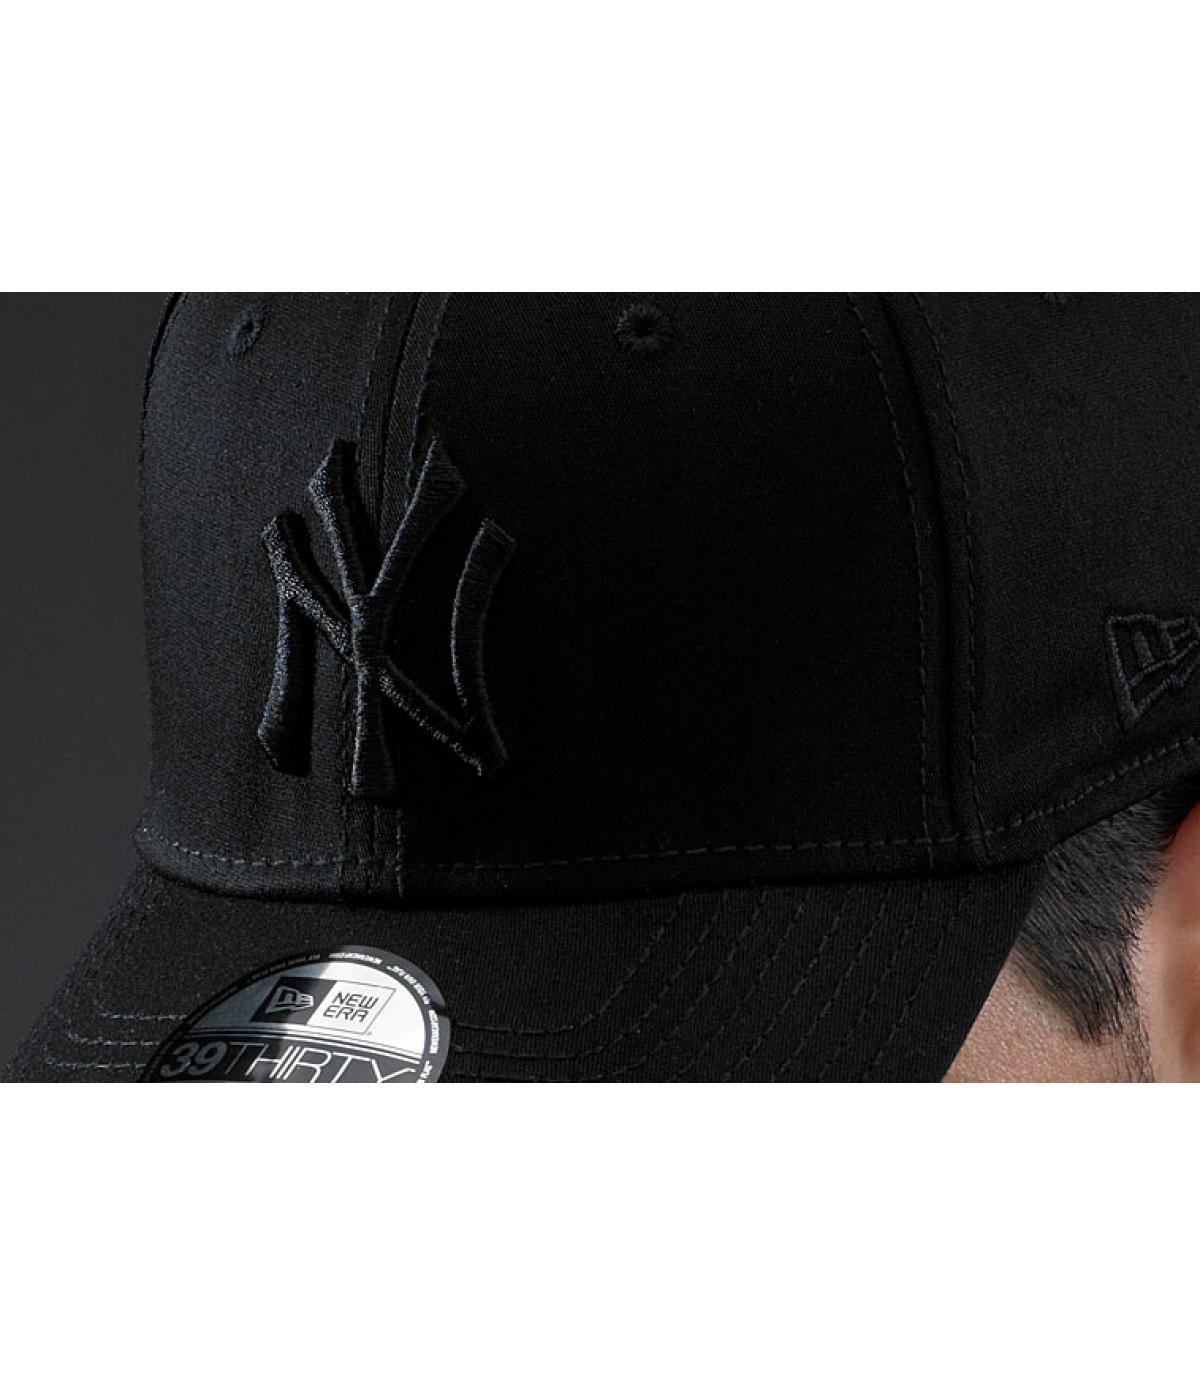 Détails 39thirty NY black black - image 5